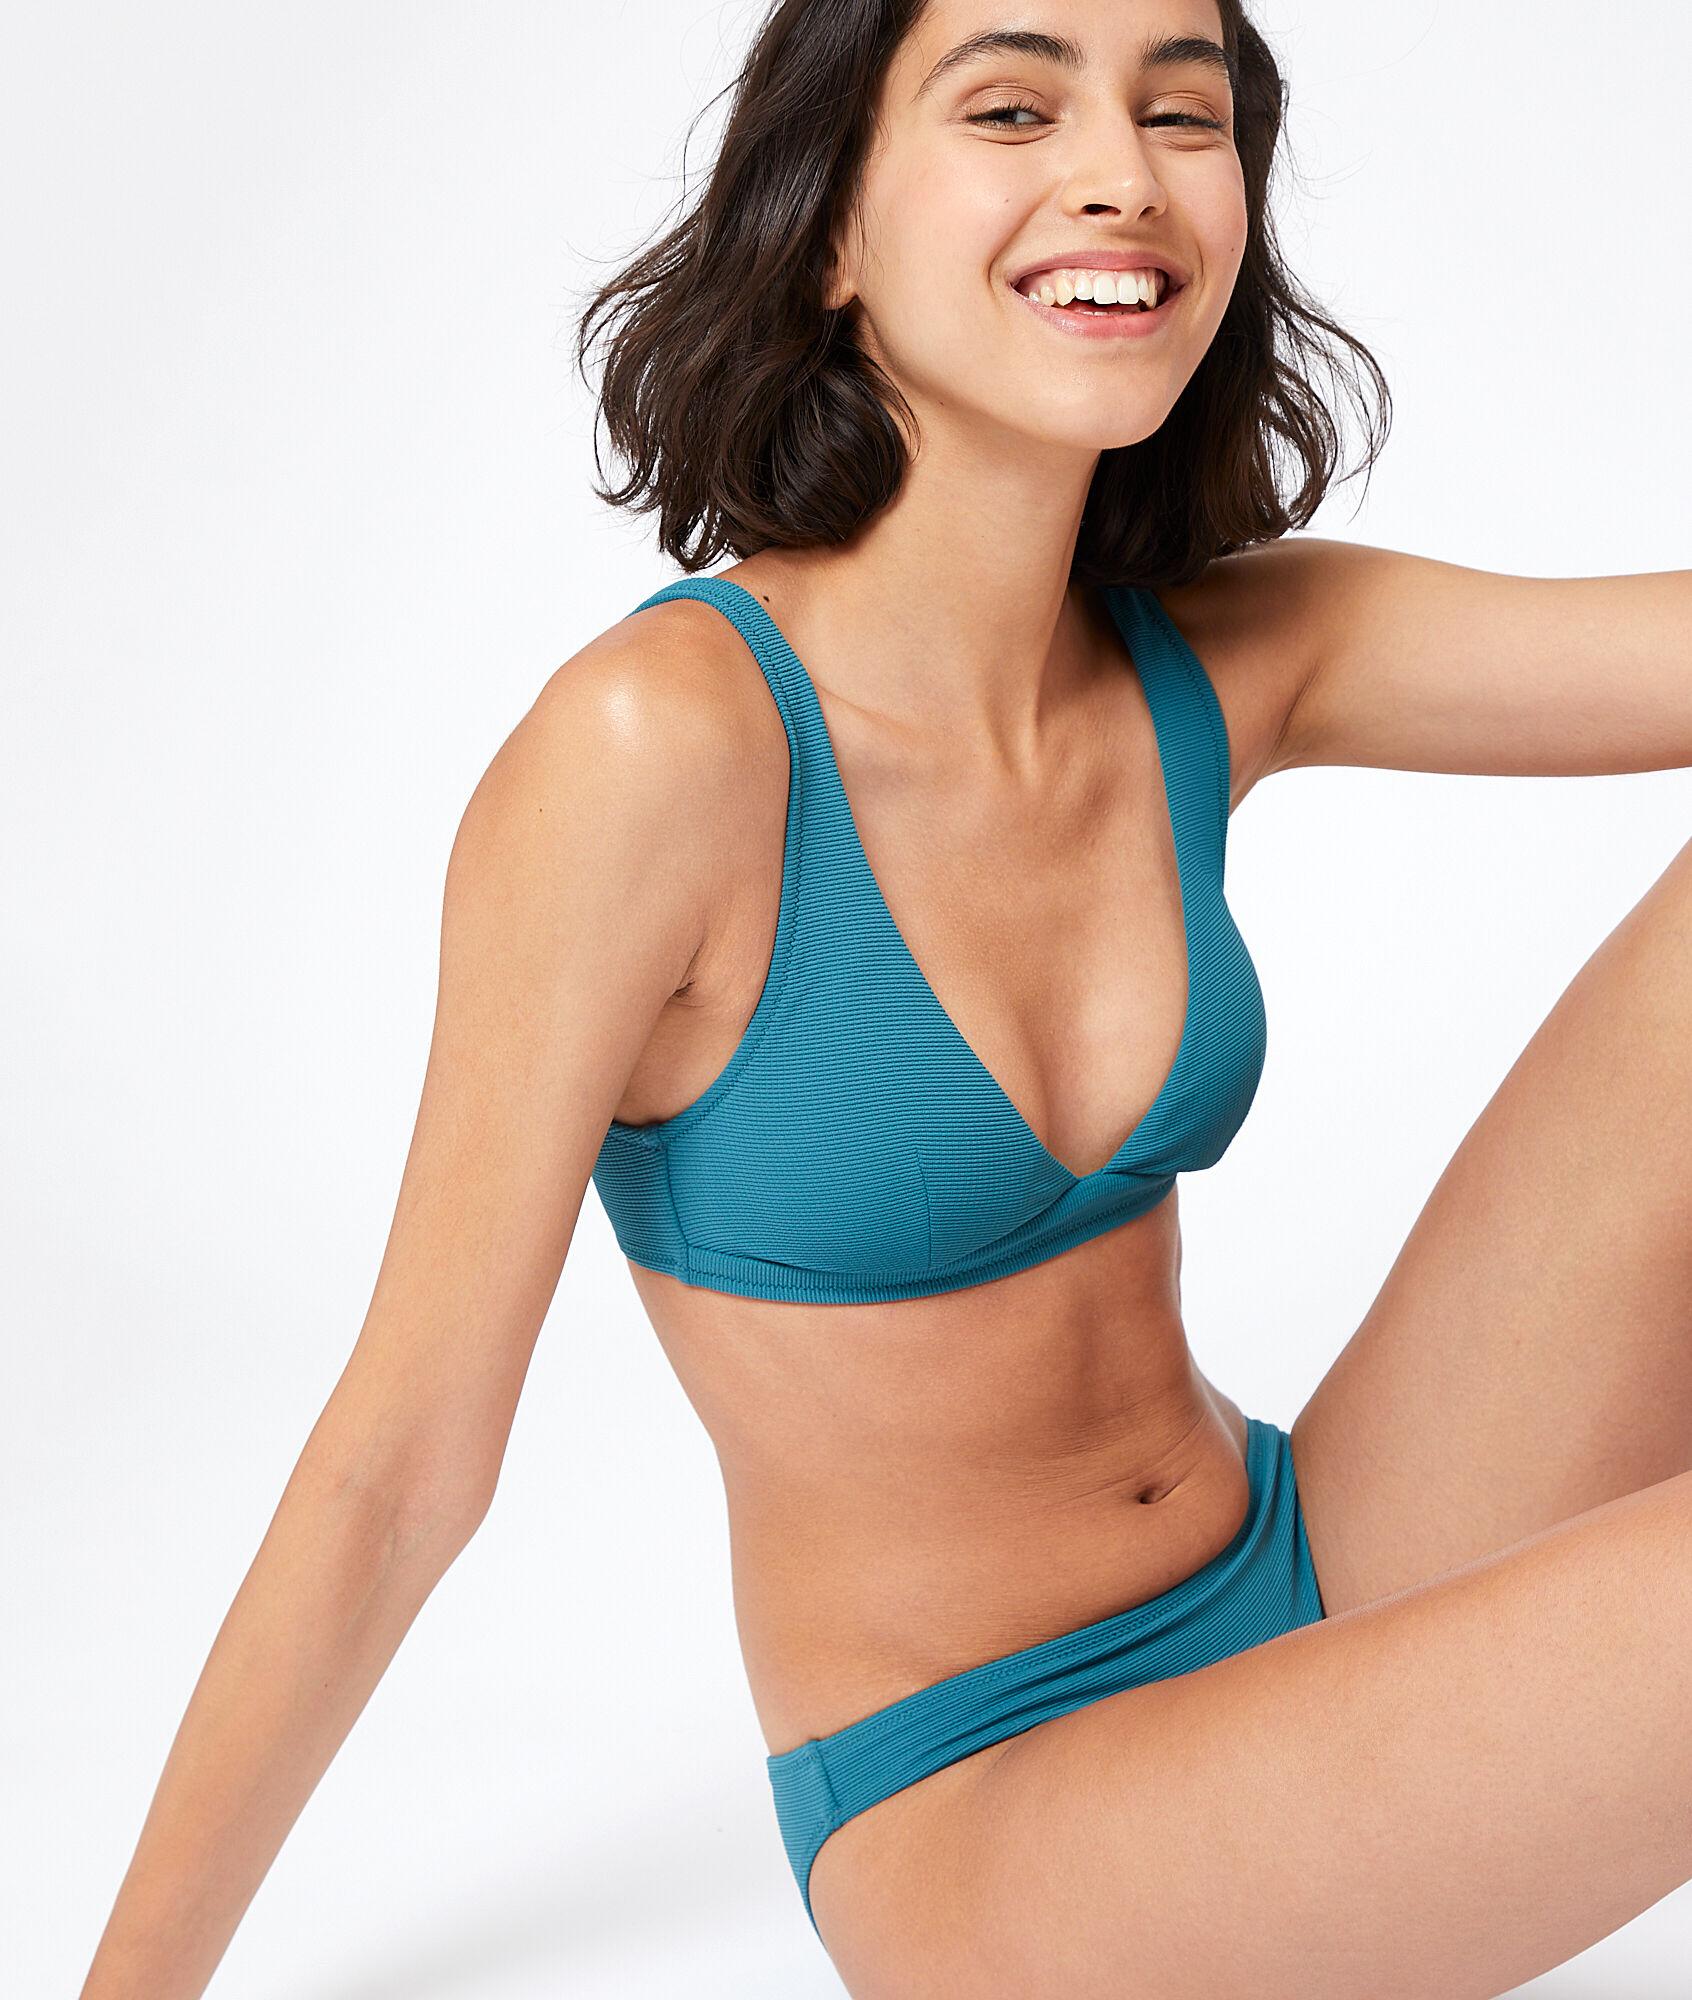 26c9884c 2019 Tendencias Bañadores Moda Baño Mujer Etam ✓ iOPkXuZ